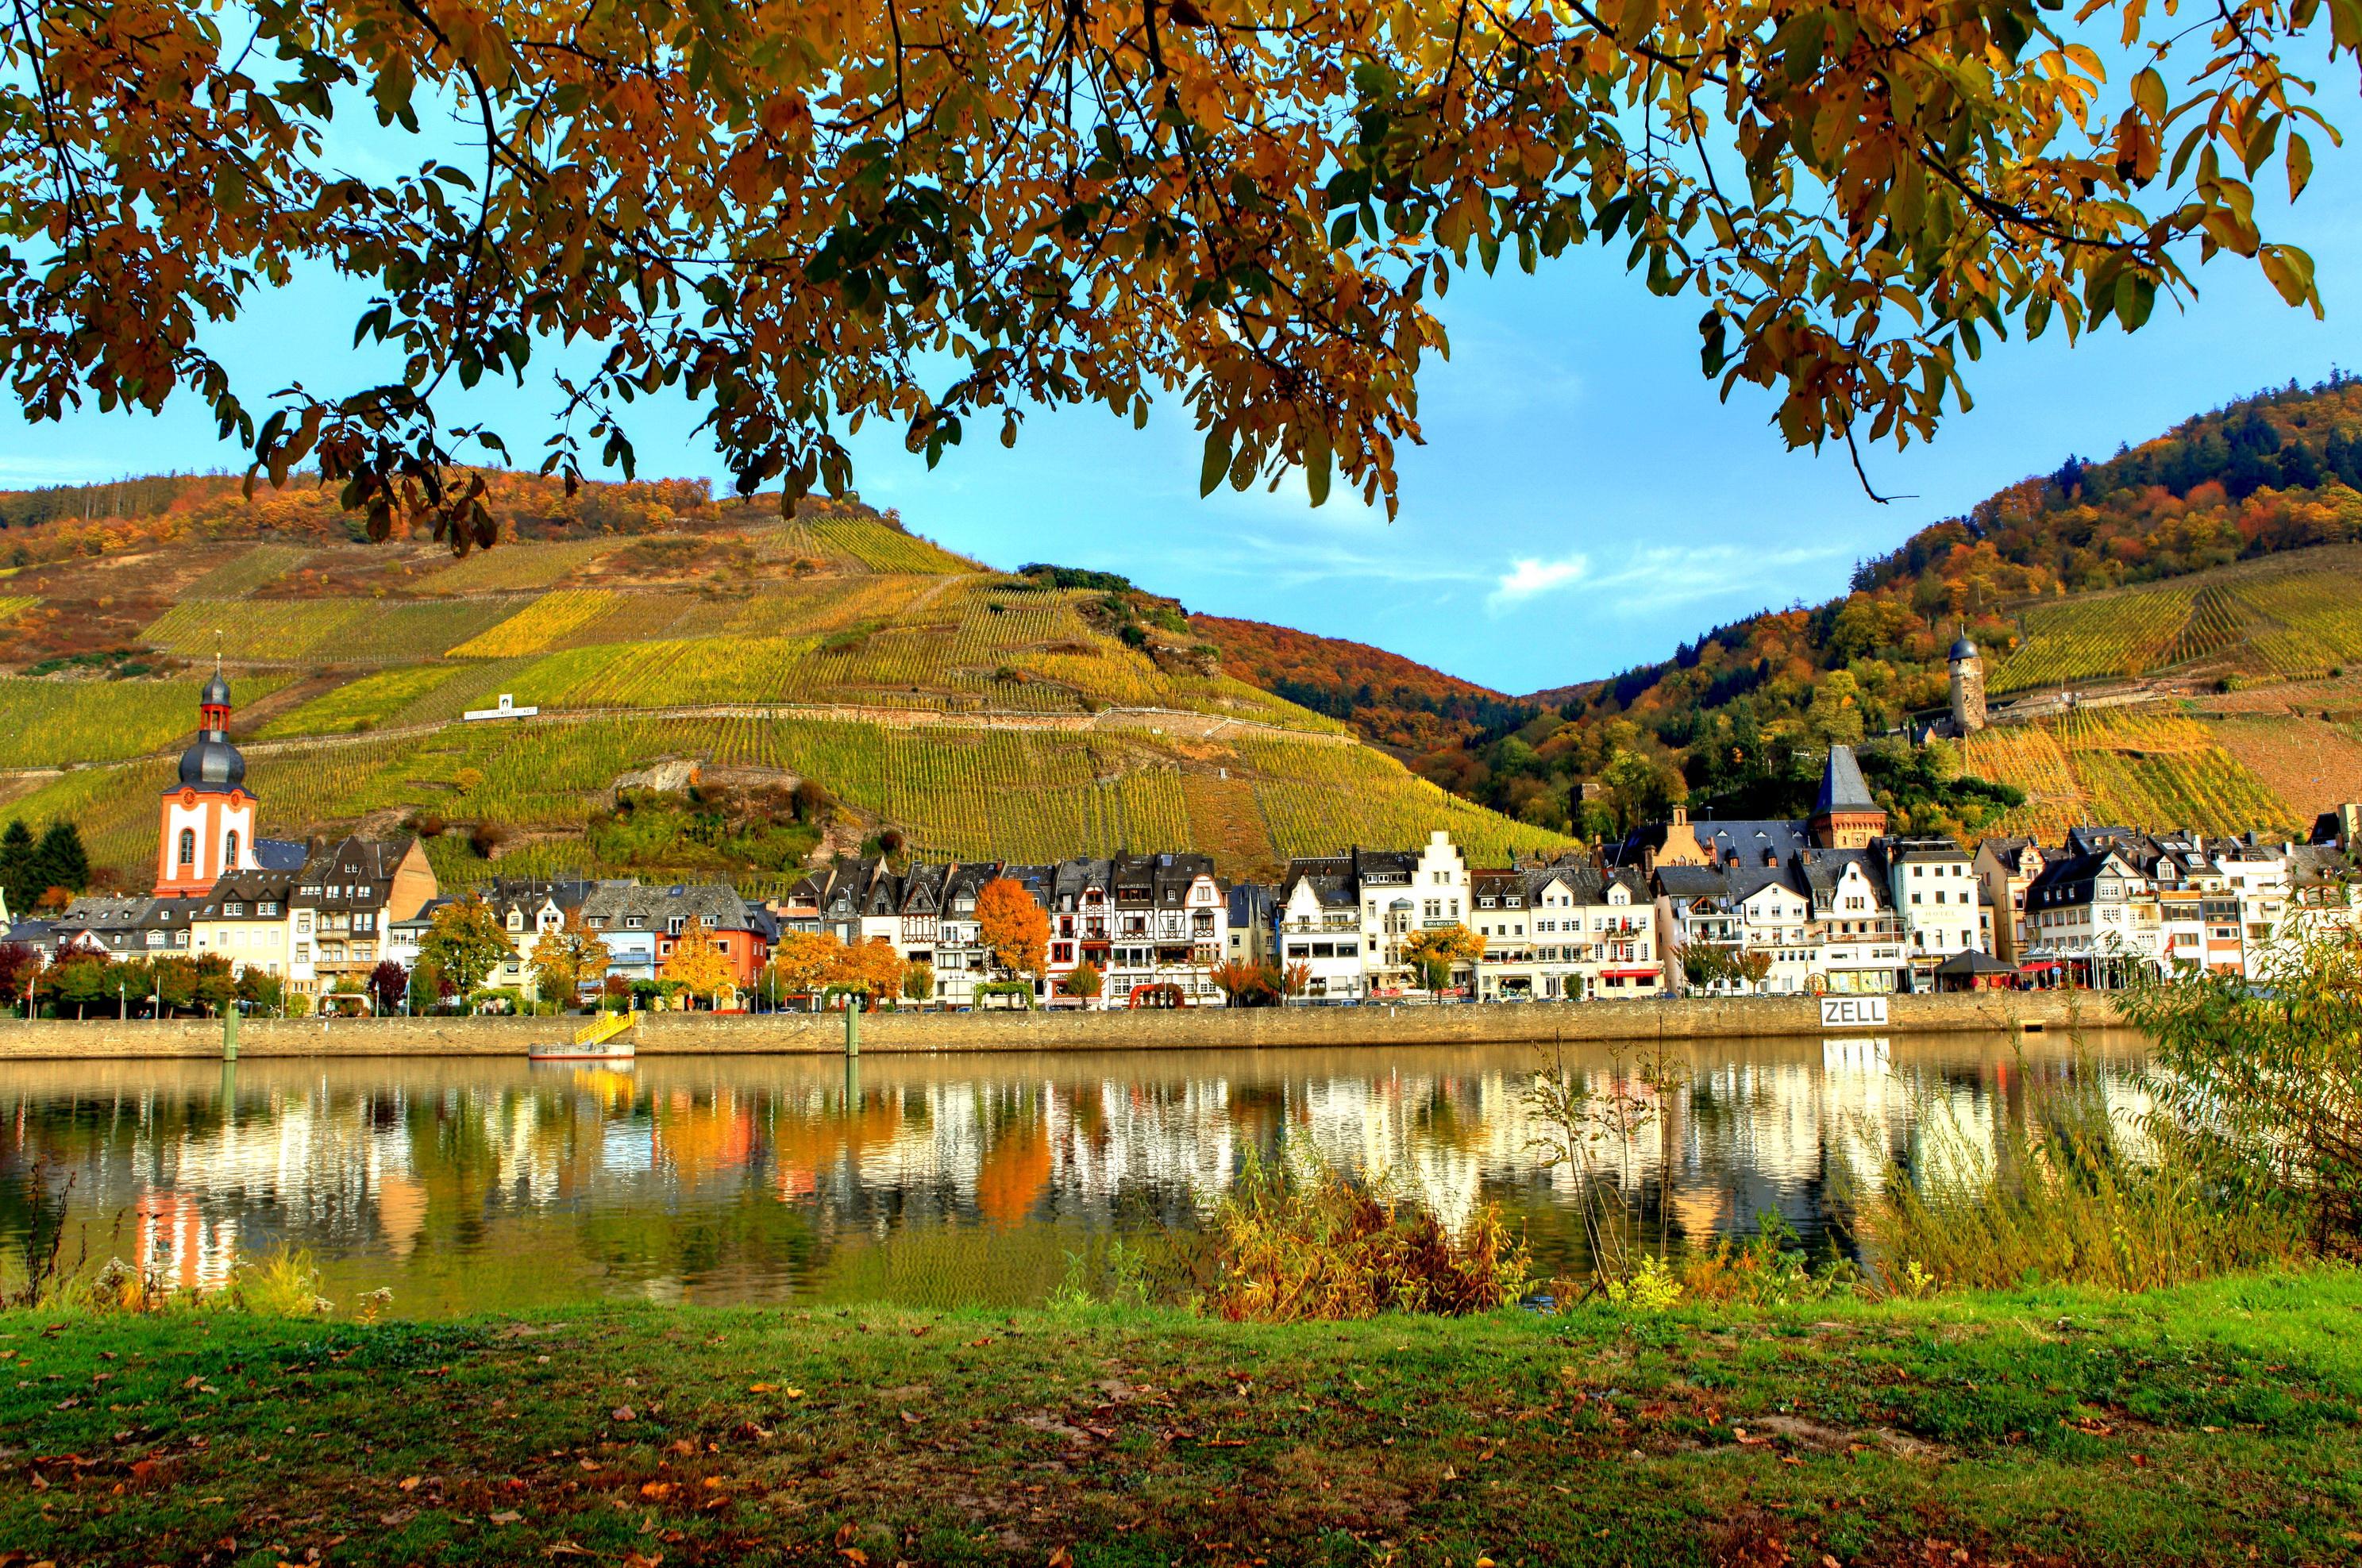 Lorch Village, Hesse, Rhine River, Germany  № 78305  скачать